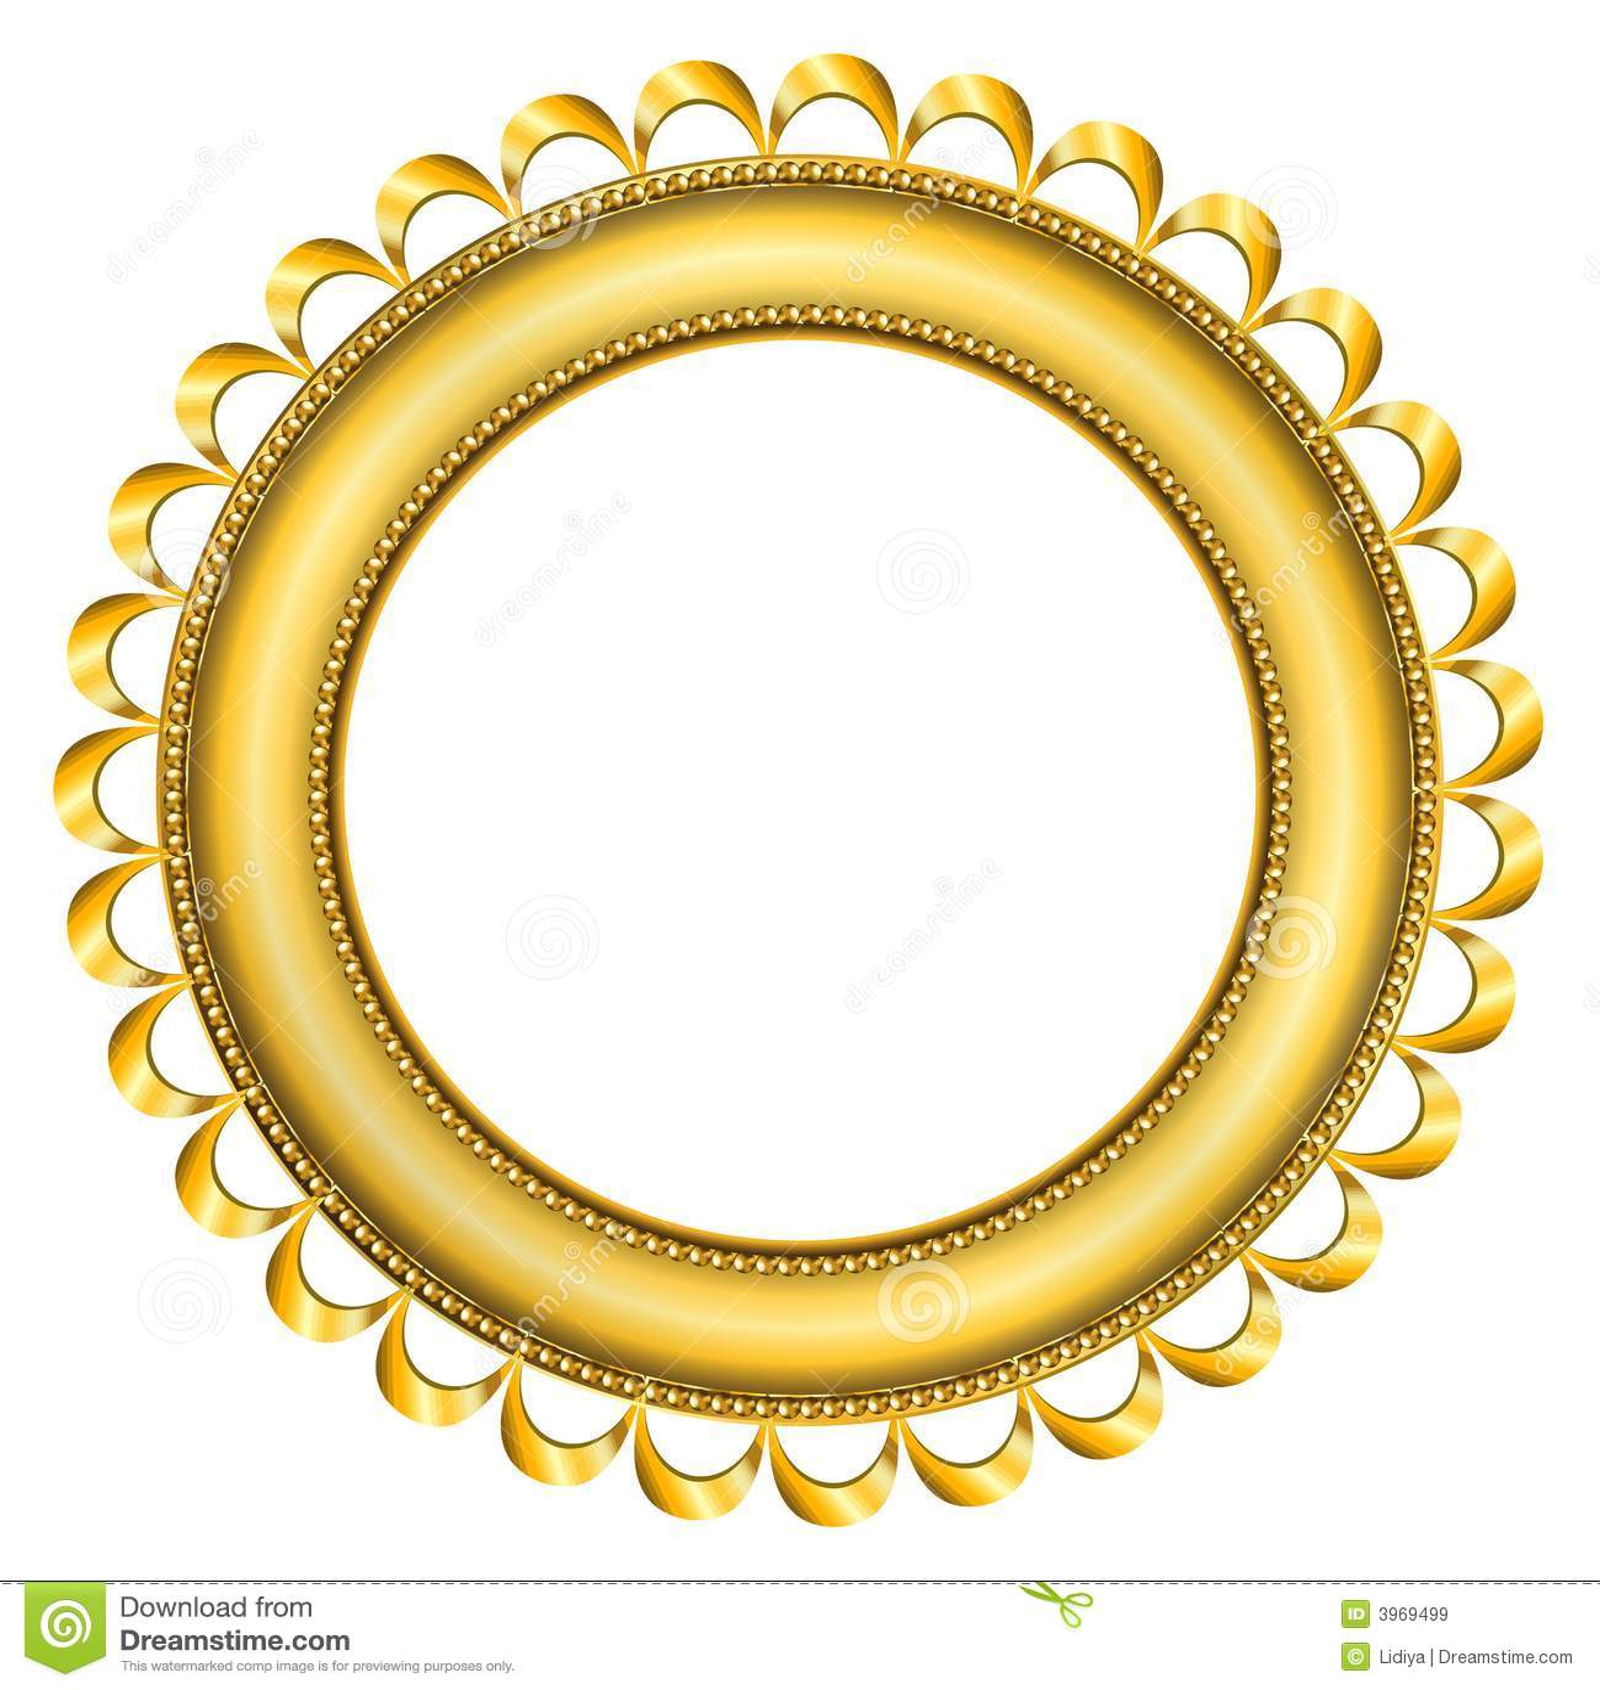 frames free borders vine border circle frame also dot circle clip art